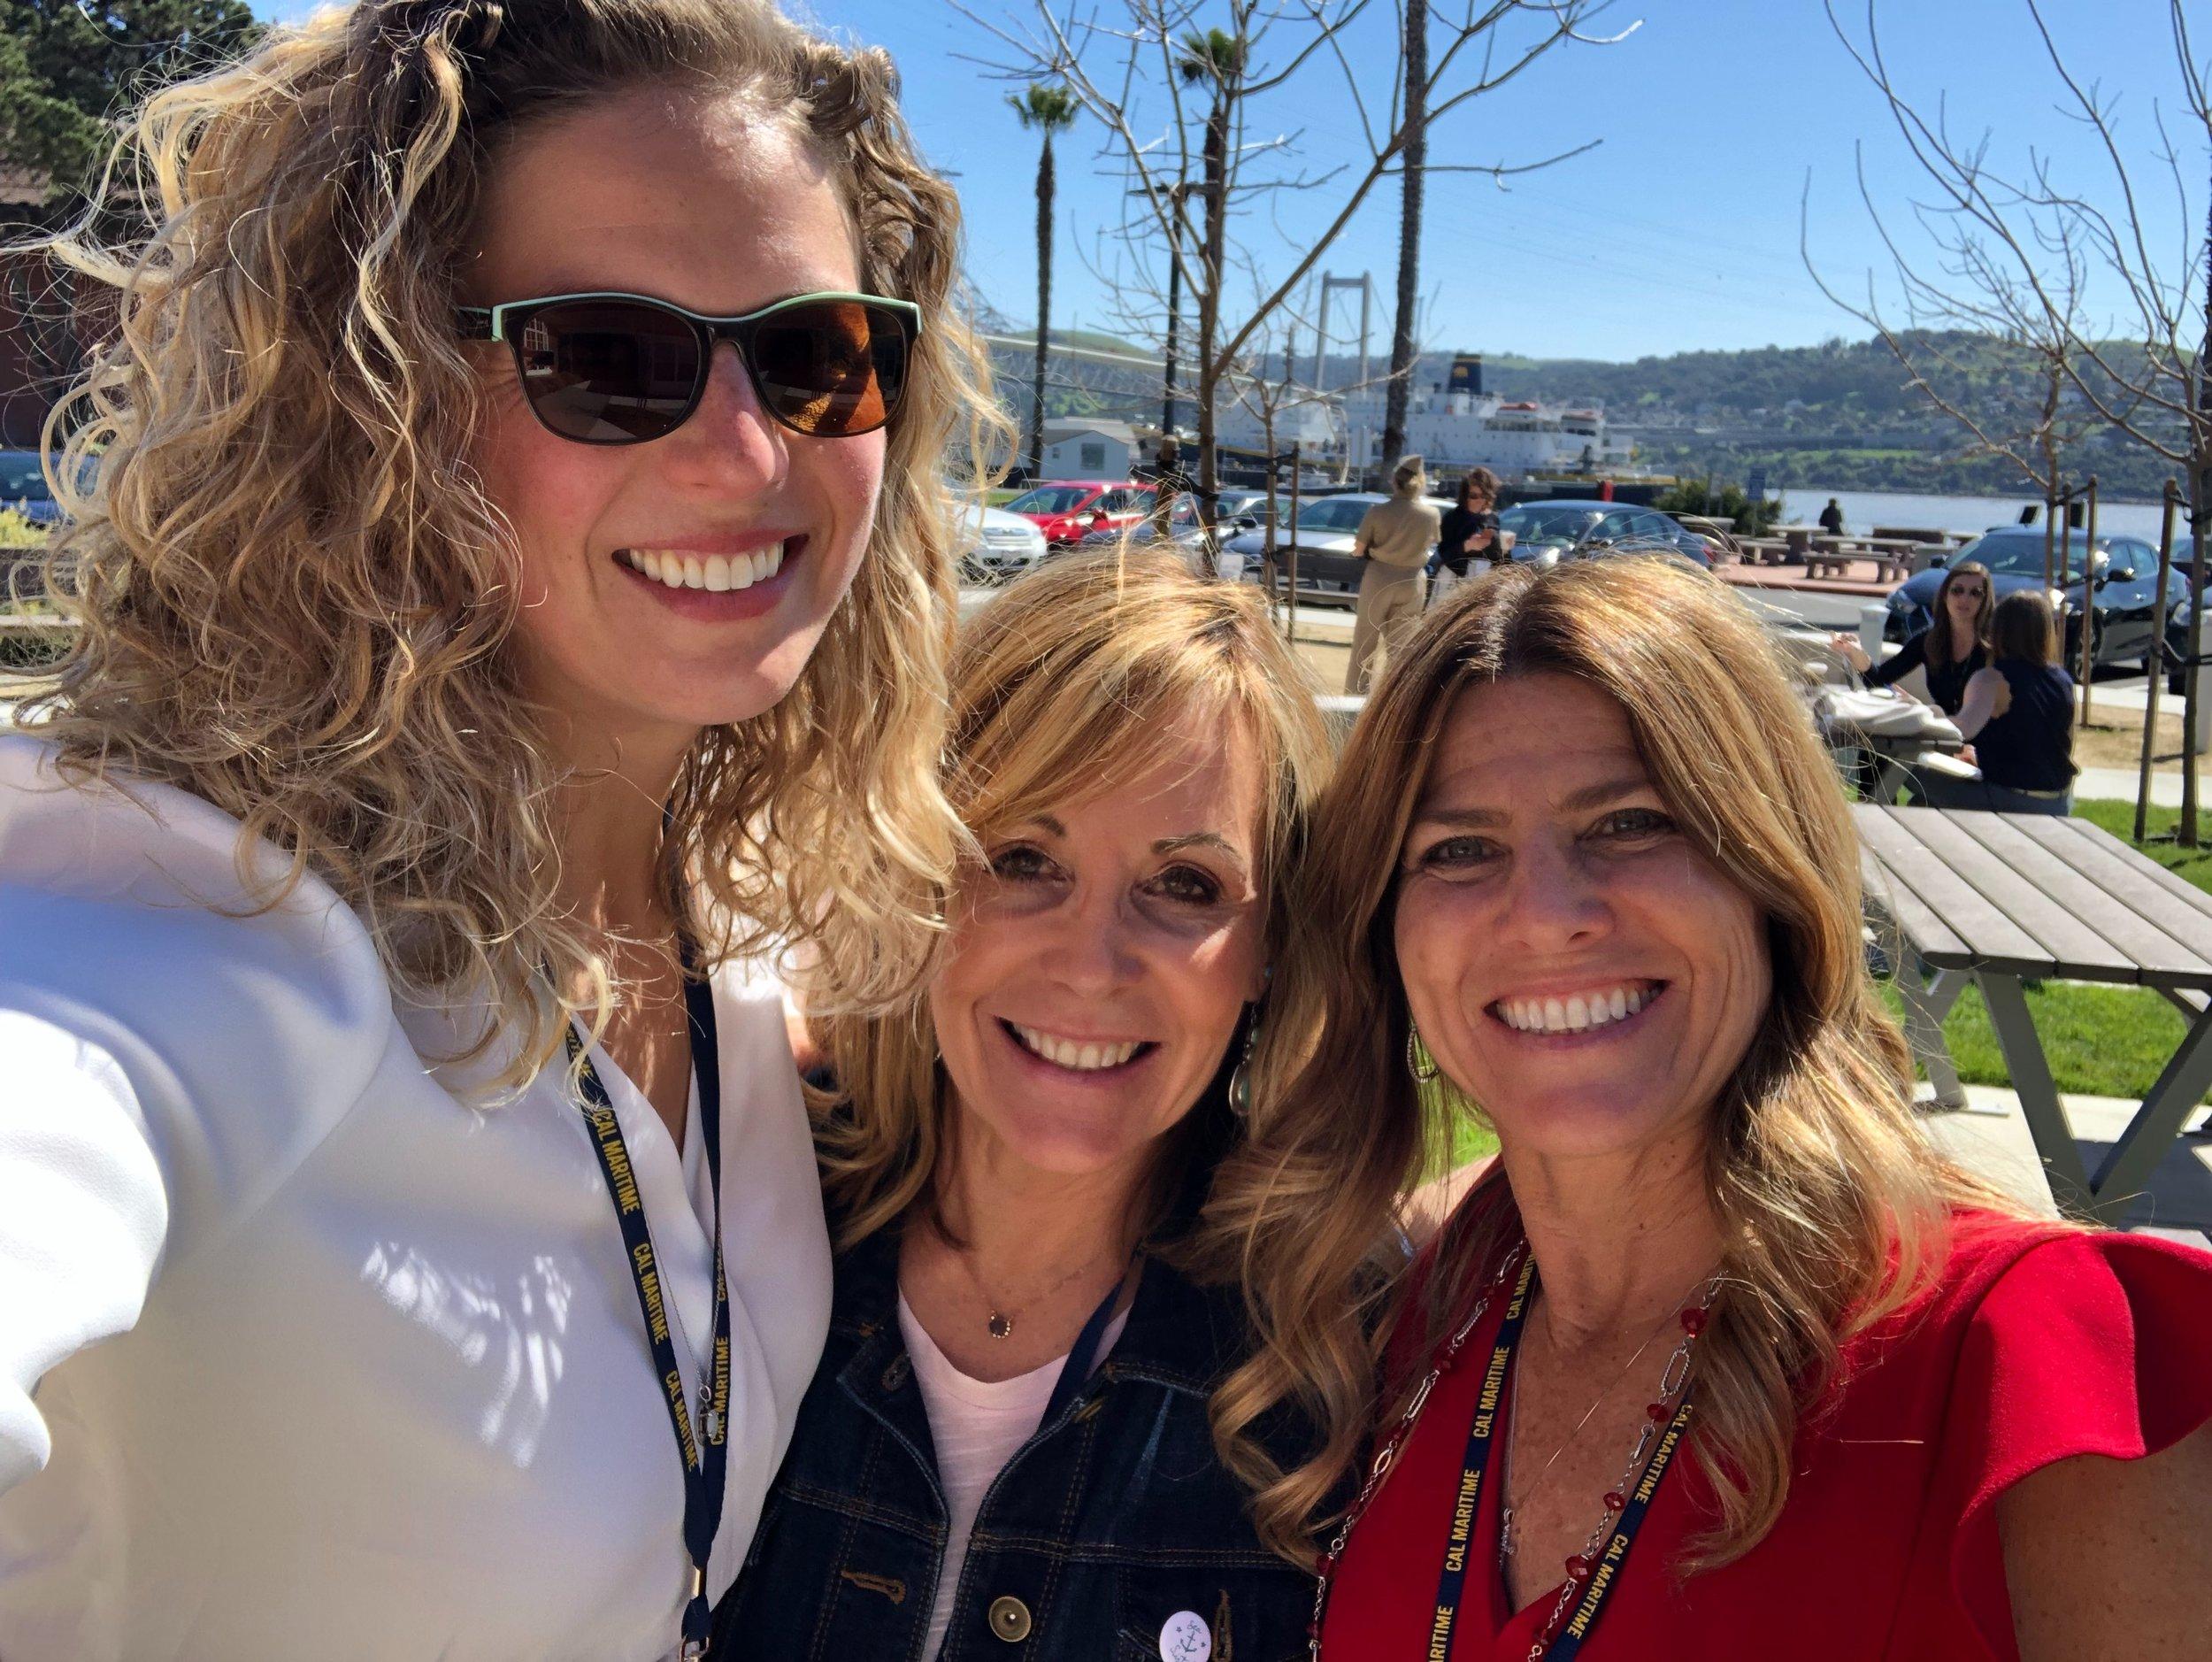 Elizabeth Simenstad, Christi Calvert, and Joy Hall enjoy some time in the sun.